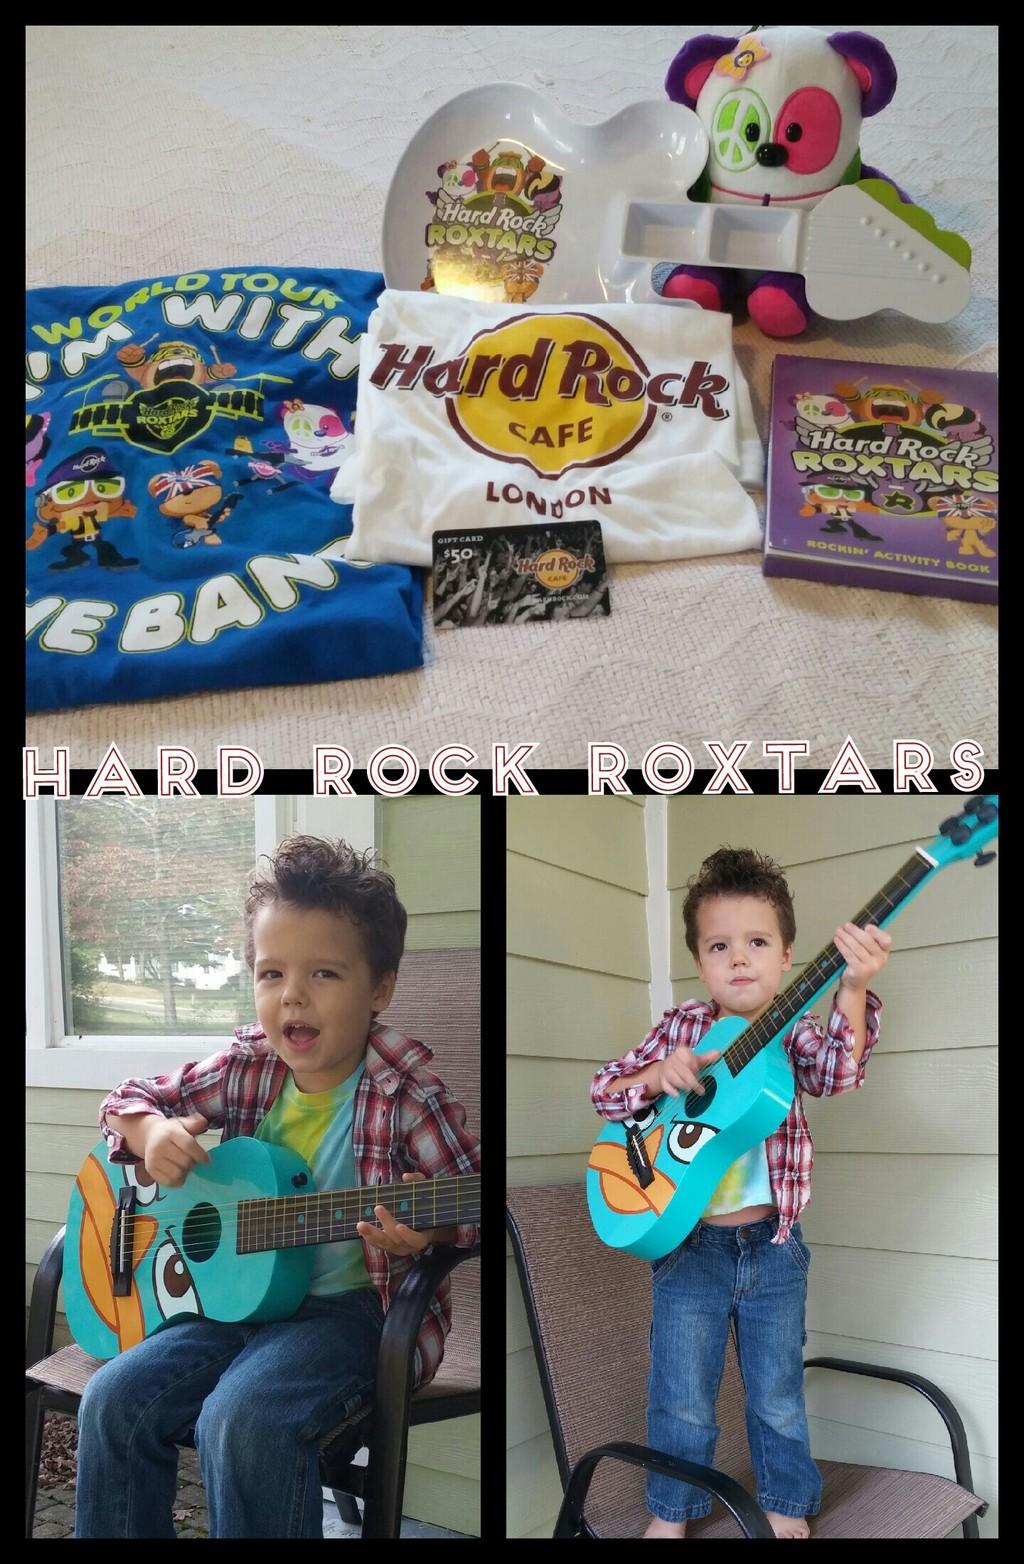 hard rock roxtars